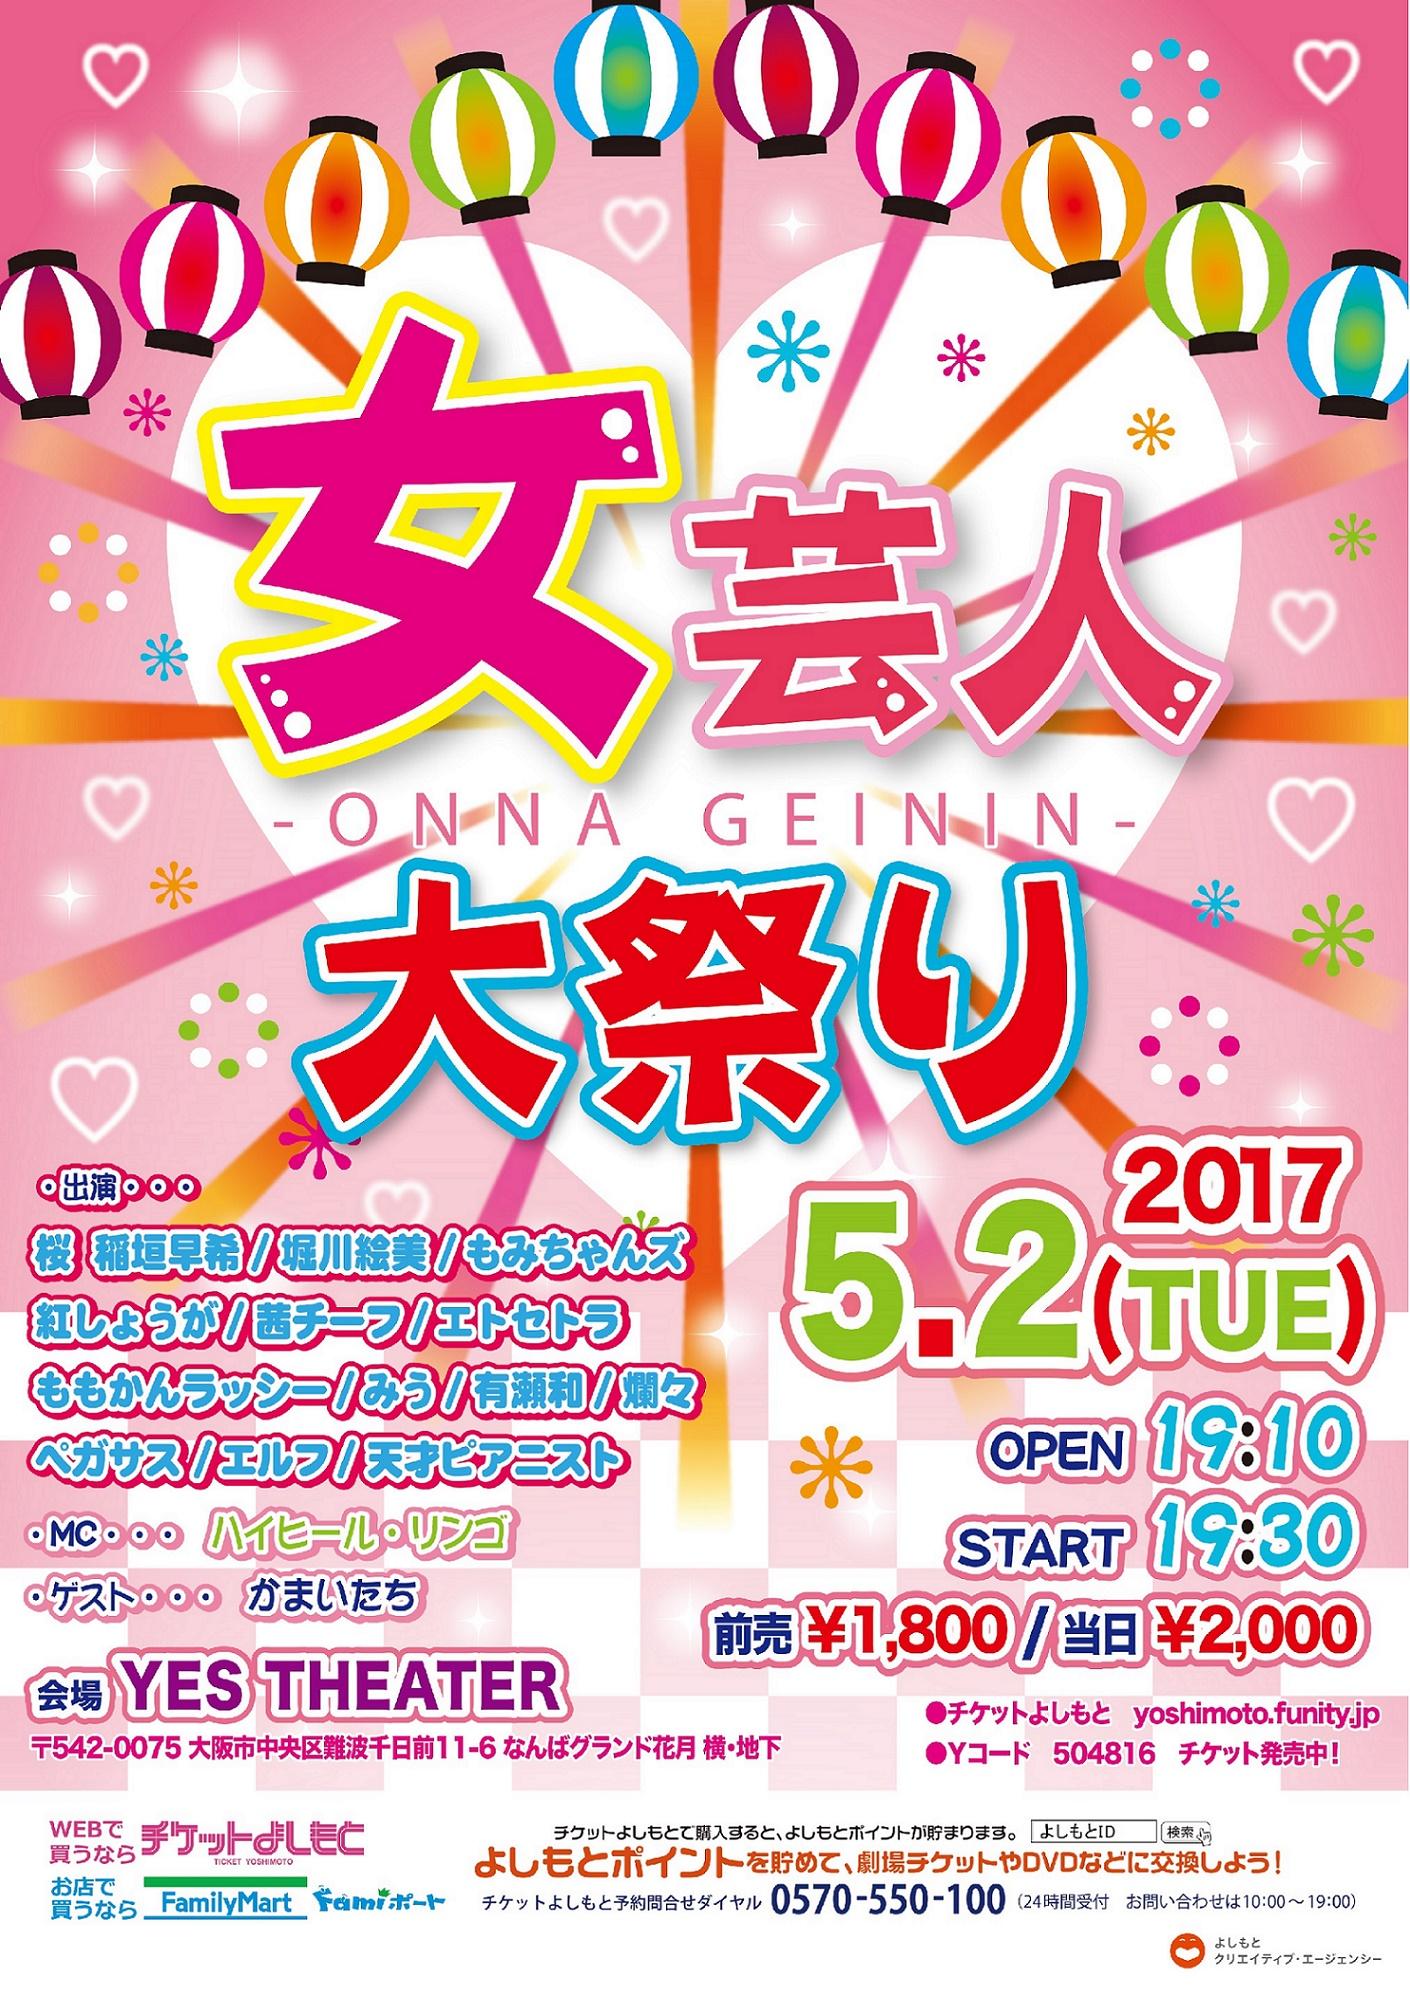 2017年5月2日(火)女芸人大祭り